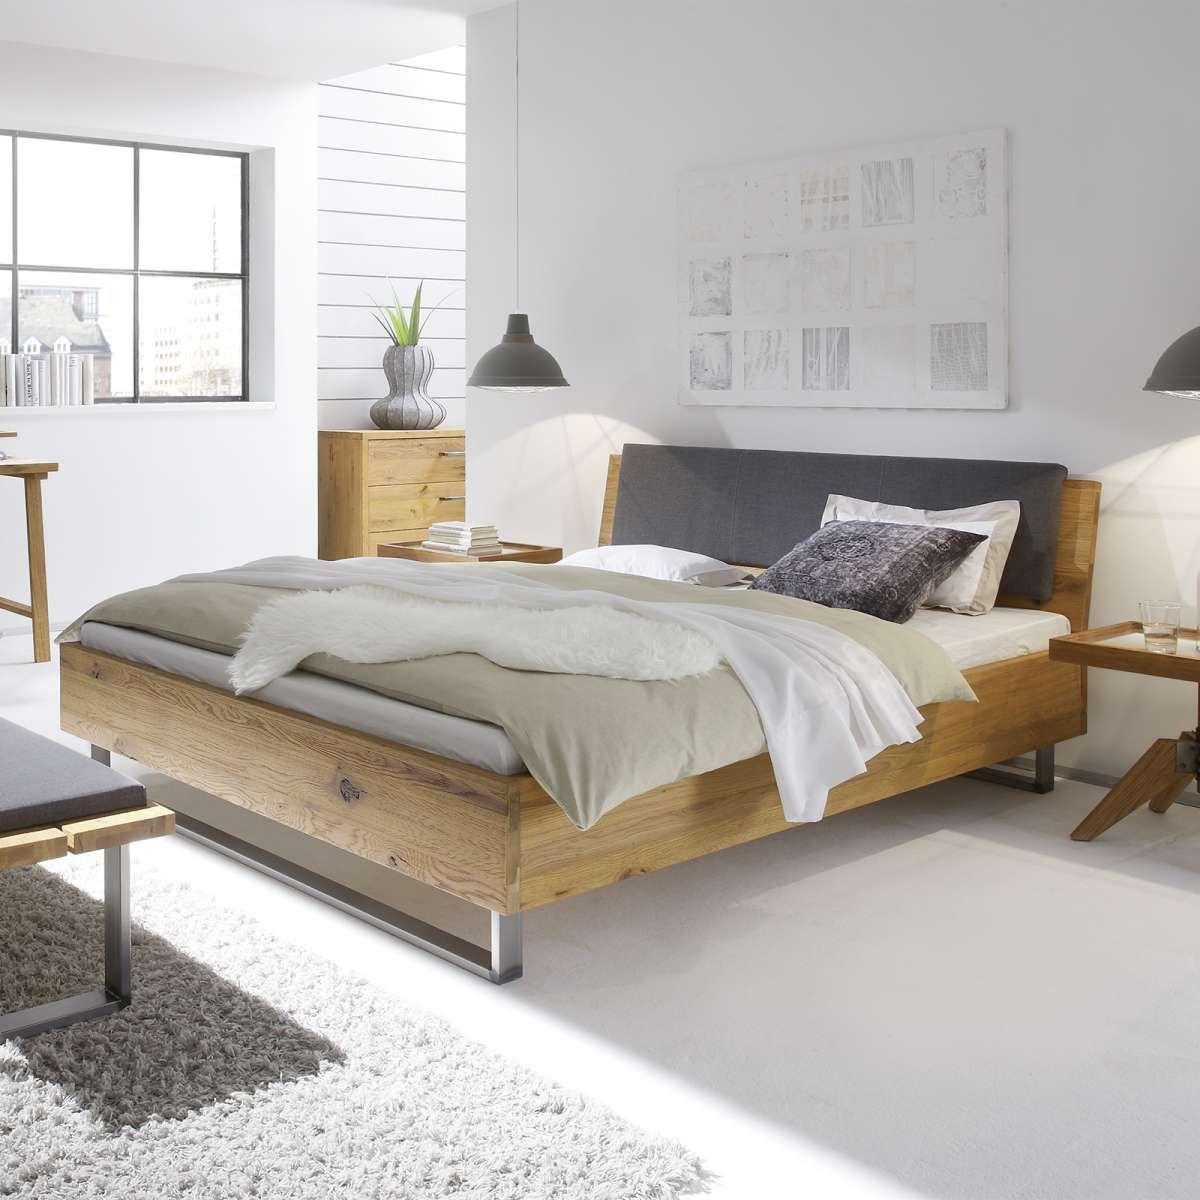 Echtholzbett Oak Wild Von Hasena Bett Modern Designer Bett Bett Eiche